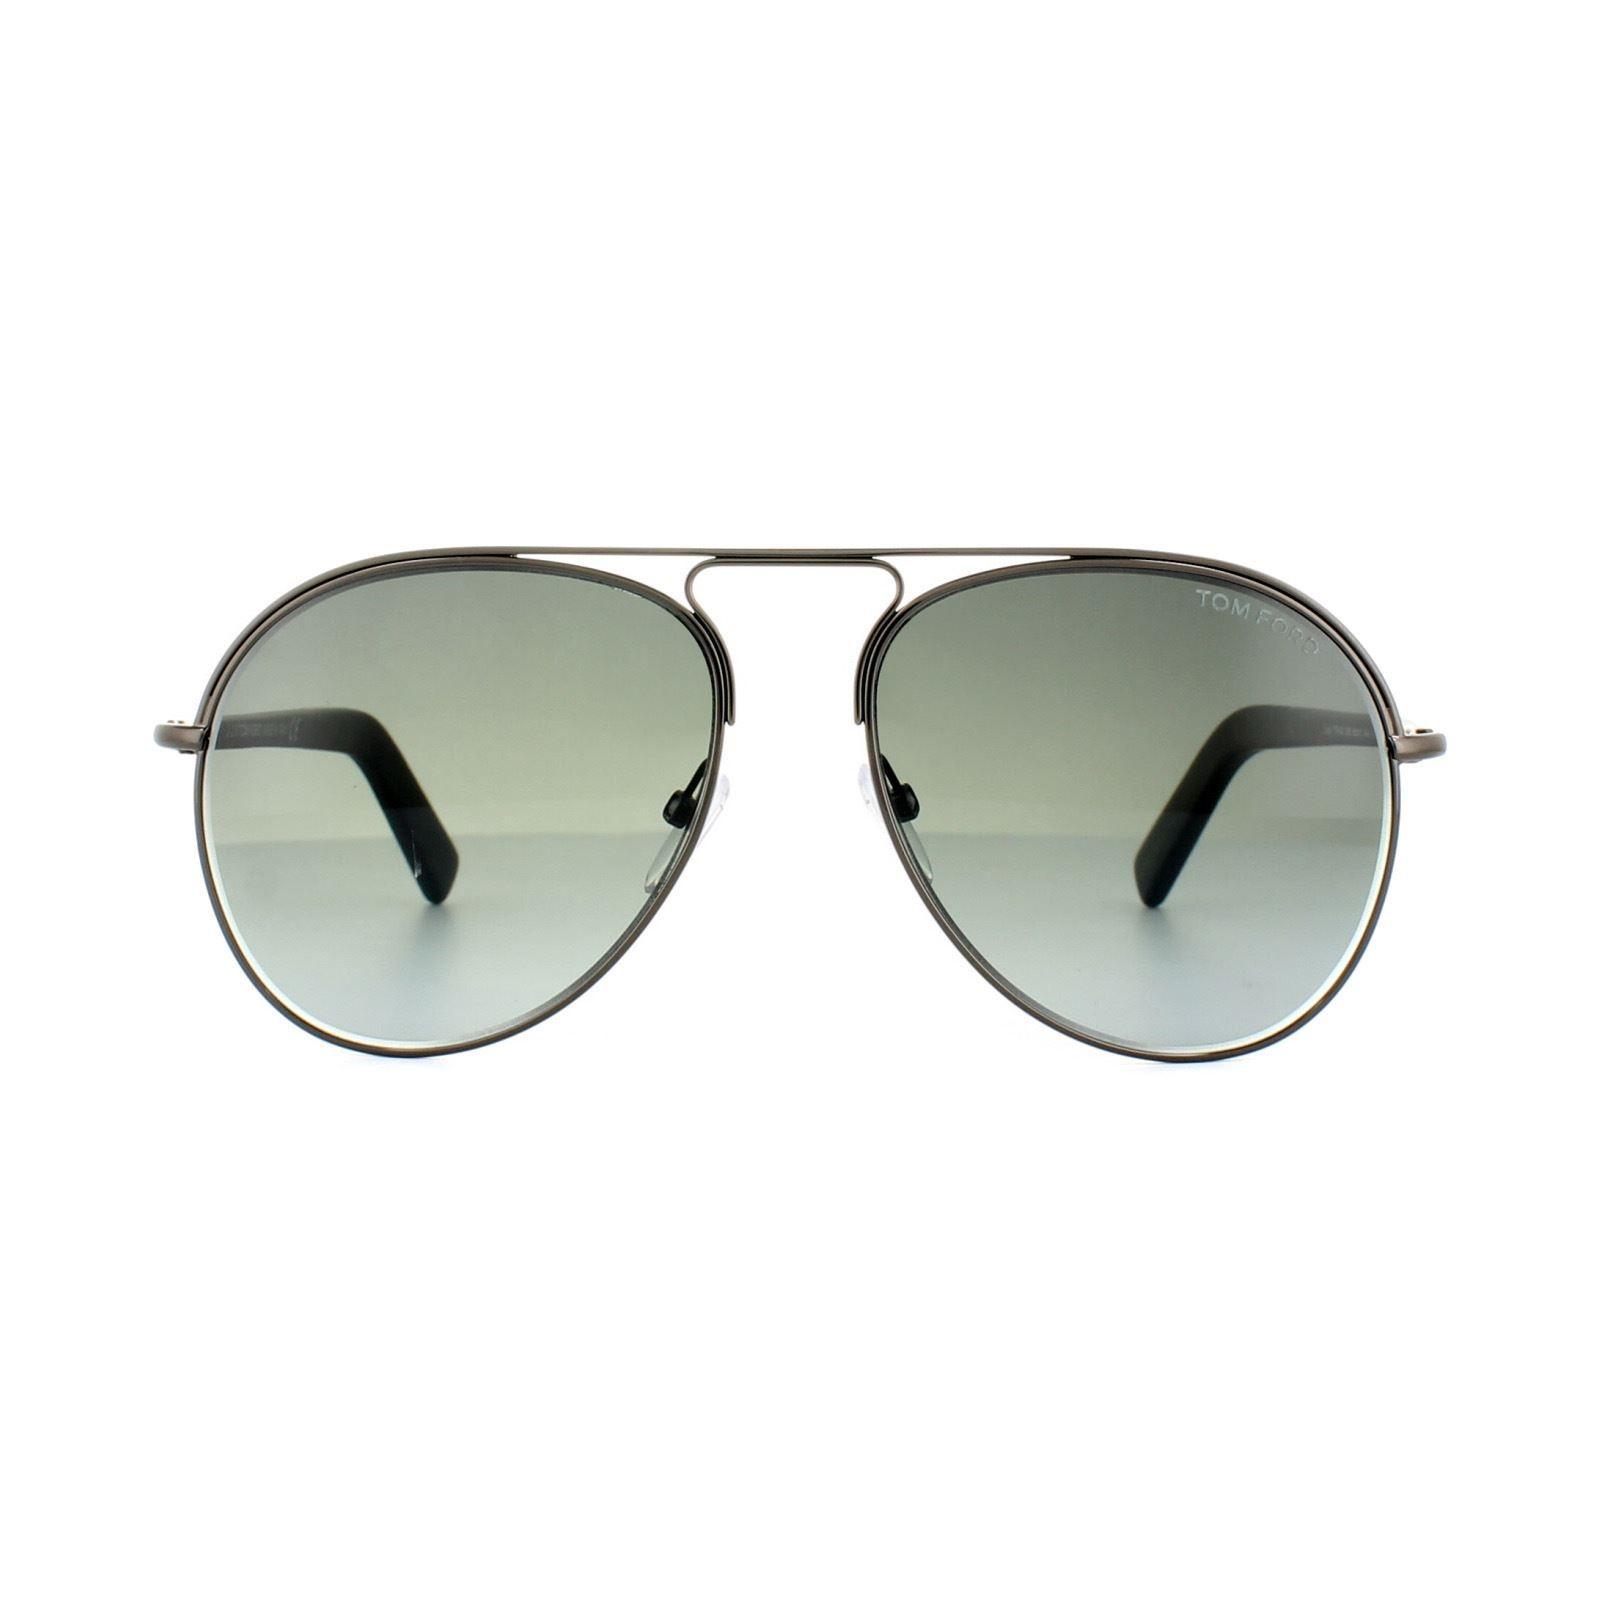 Tom Ford Sunglasses 0448 Cody 08B Shiny Anthracite Grey